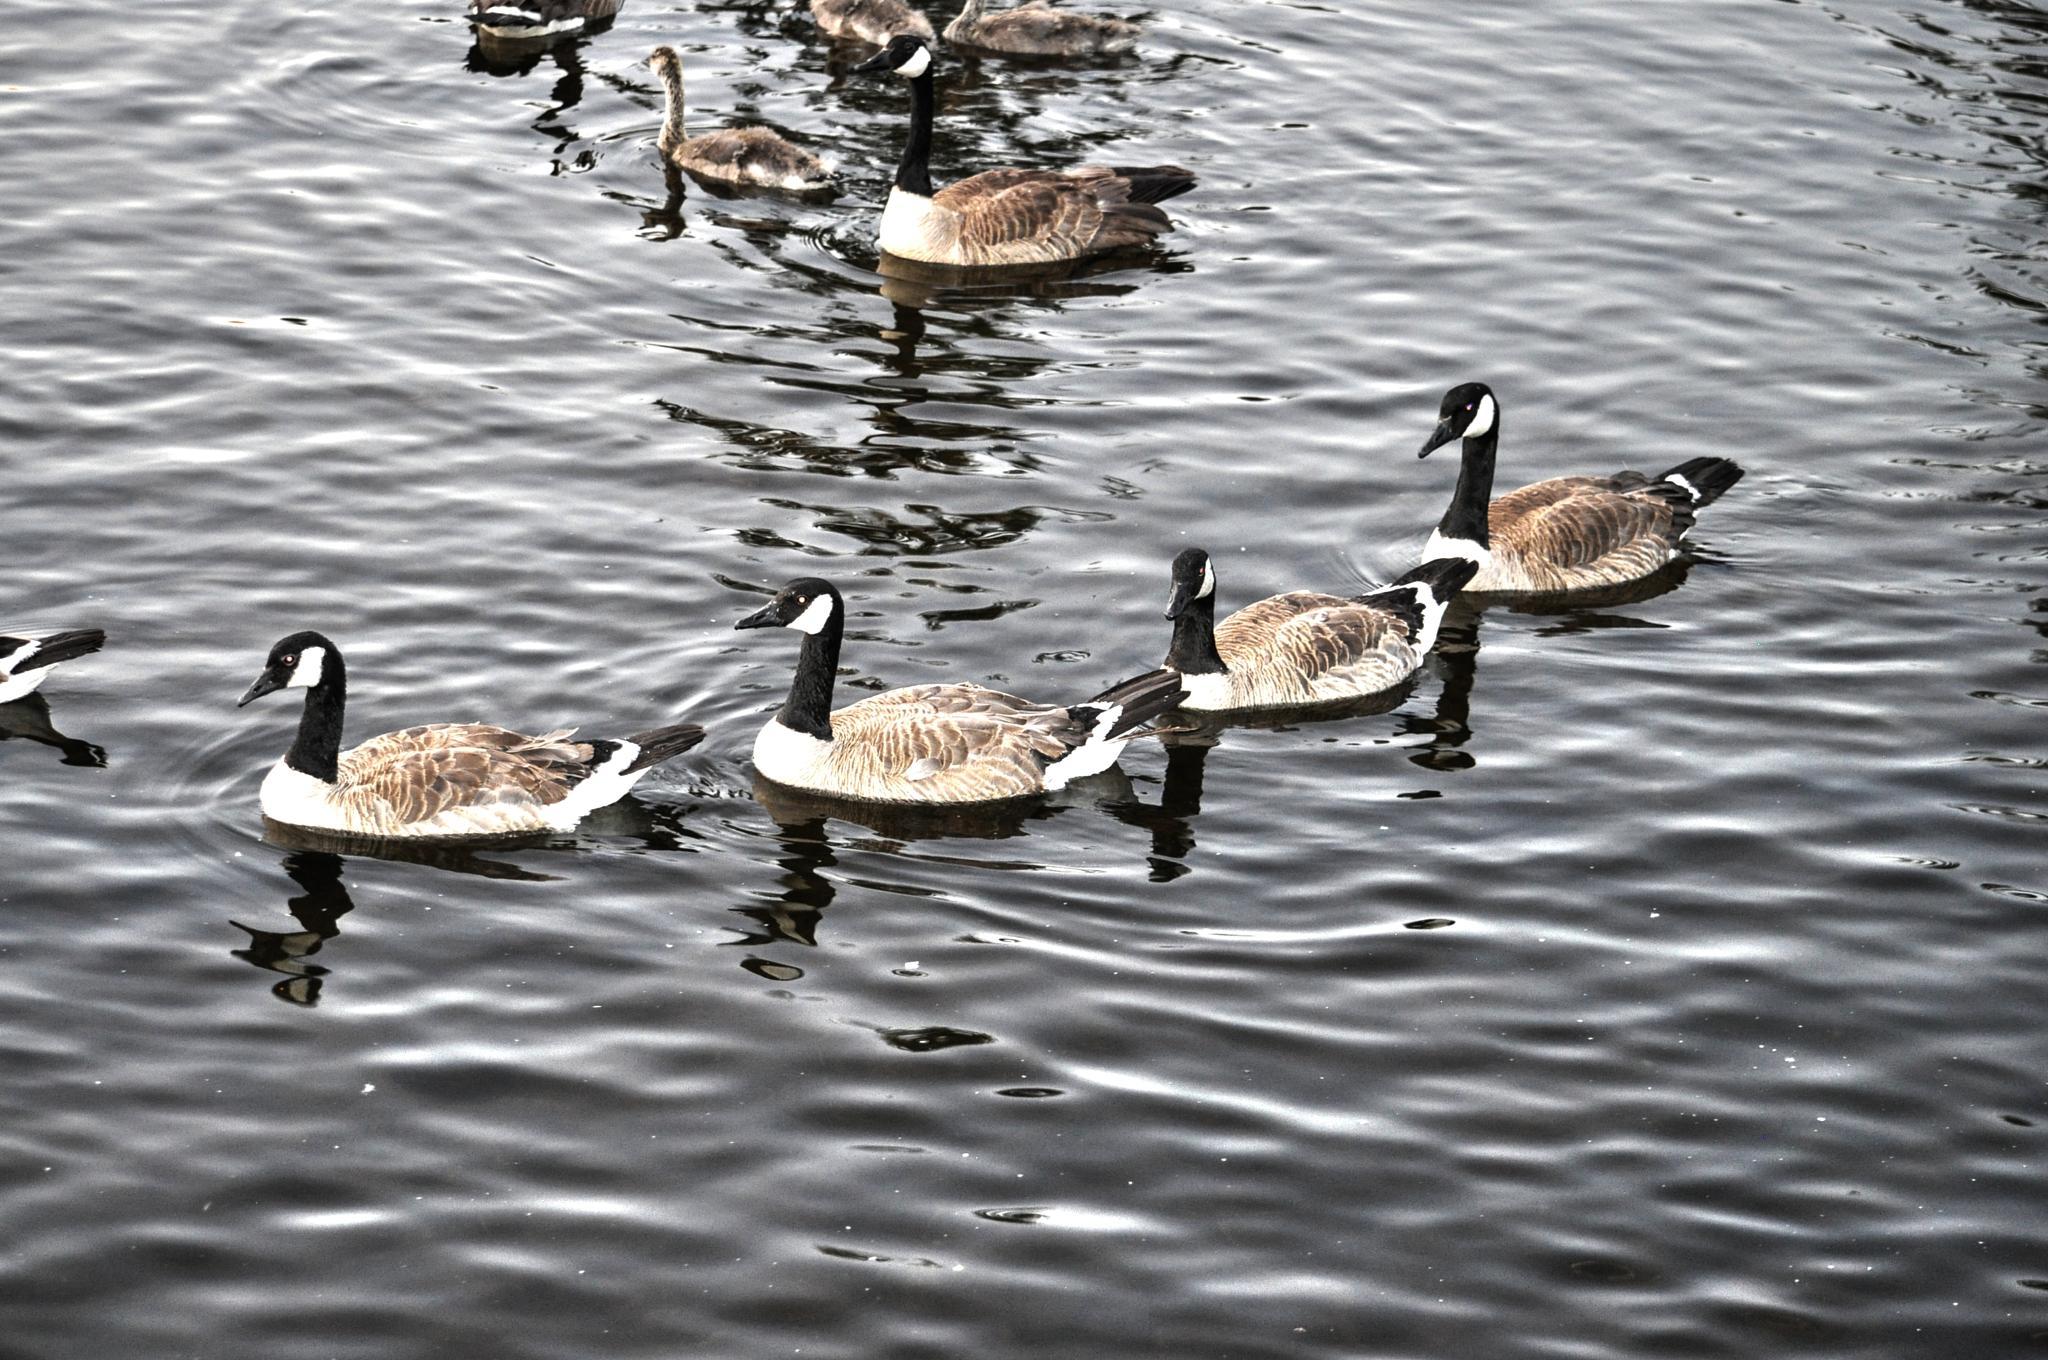 All My Ducks in a Row by Jaime Cantu